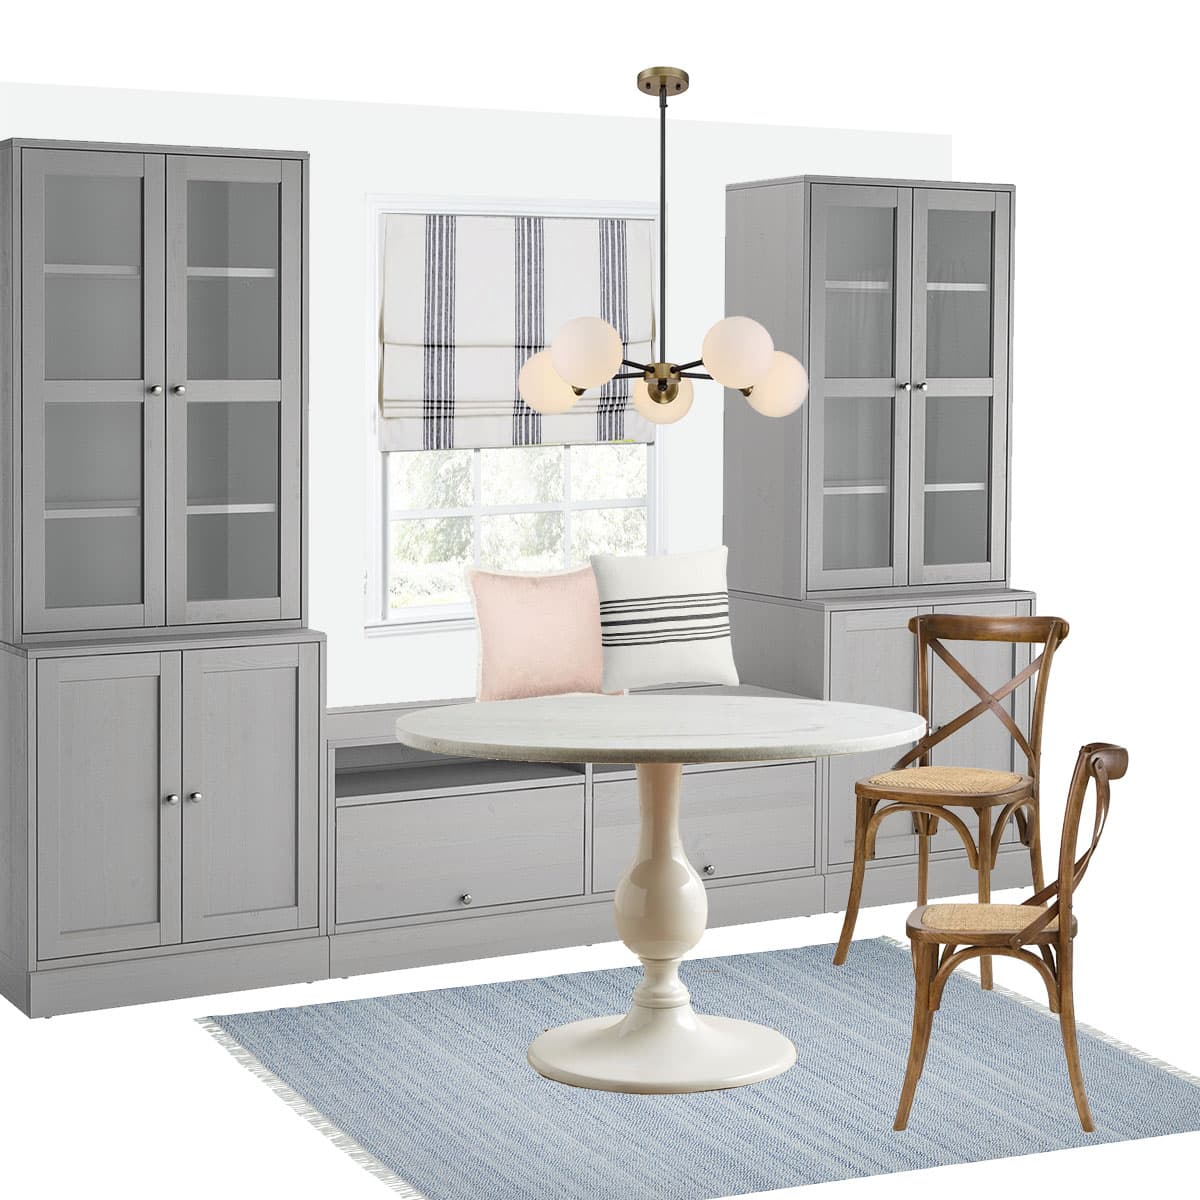 Diy Ikea Banquette Seating Built In Ikea Havsta Hack